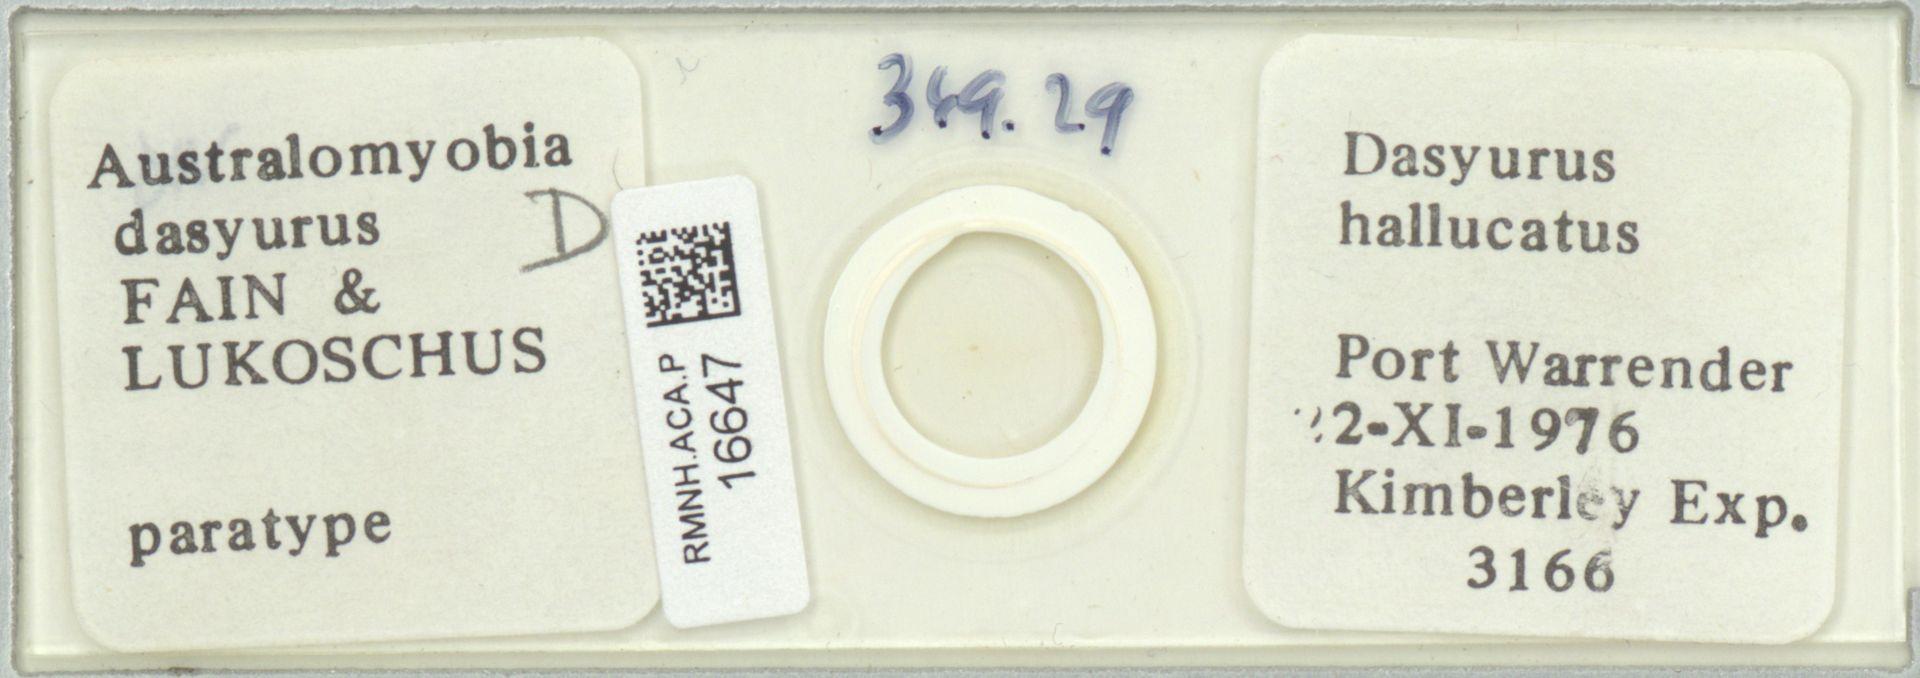 RMNH.ACA.P.16647 | Australomyobia dasyurus